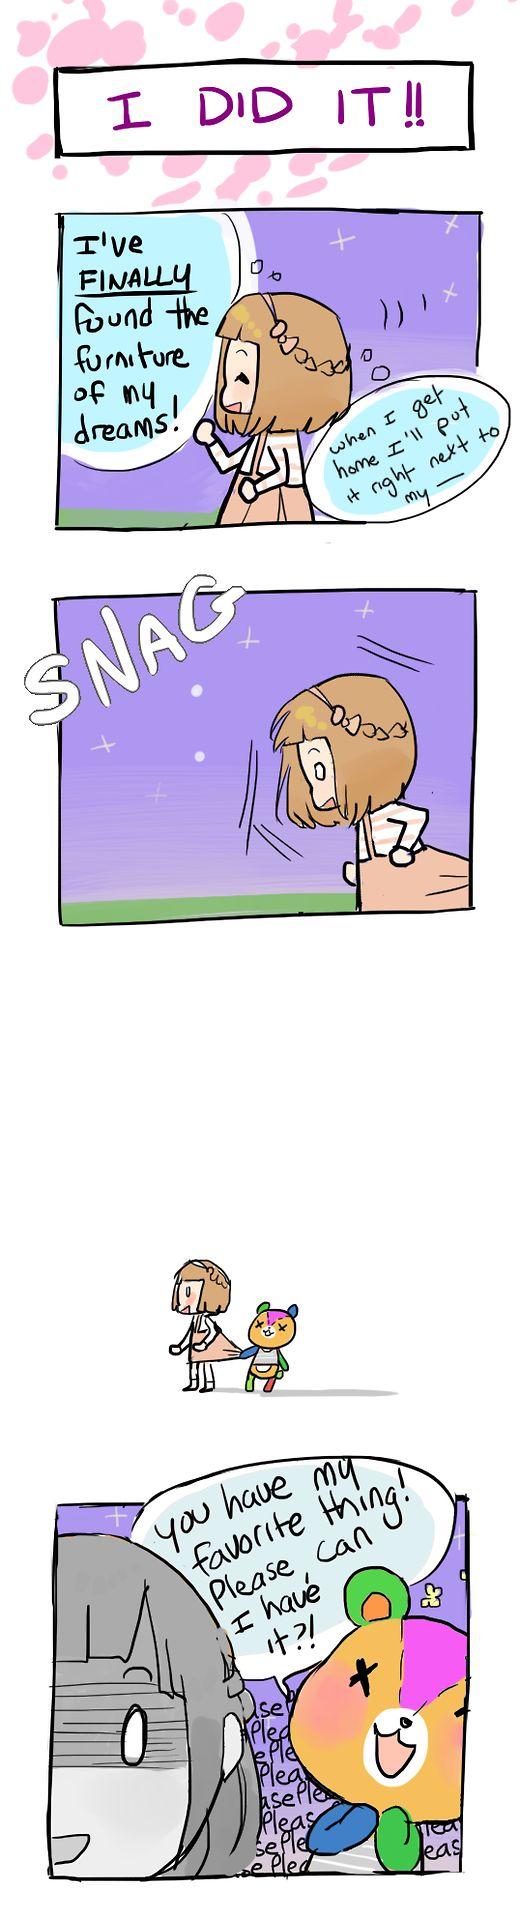 Mejores 142 Im Genes De Animal Crossing En Pinterest Animal  # Muebles Festivos Animal Crossing